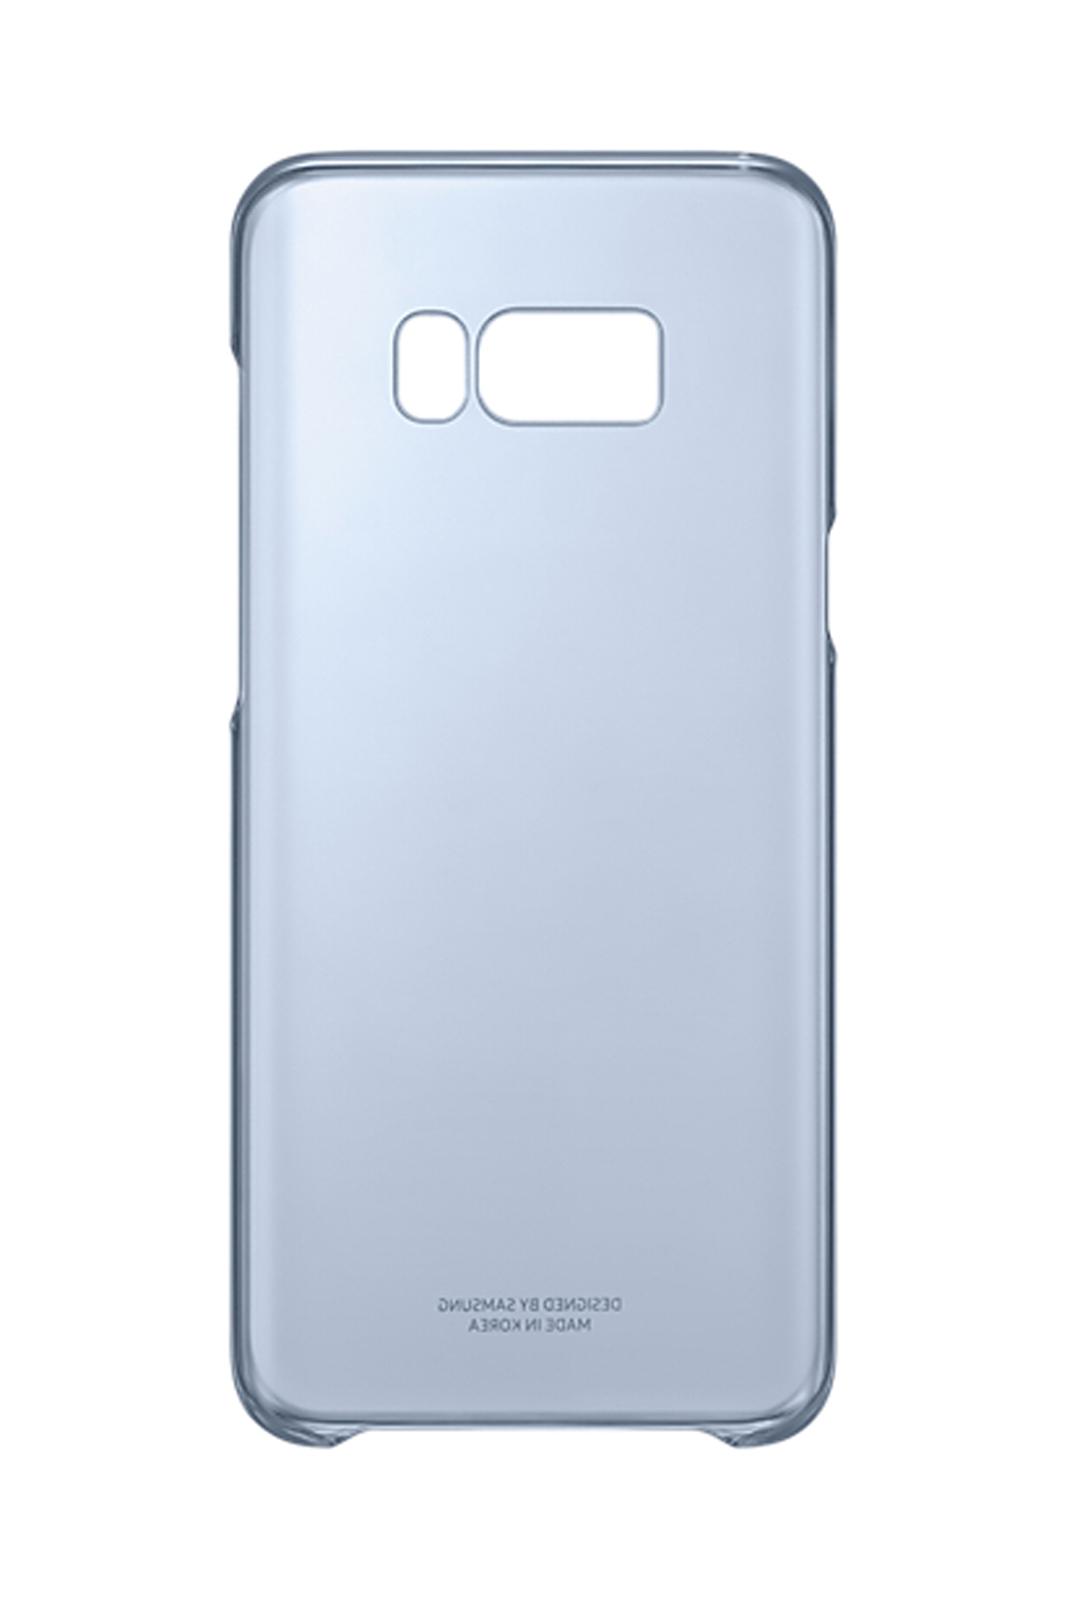 big sale e514e e35b4 Details about Official Samsung Galaxy S8+ Blue Clear Cover - EF-QG955CLEGWW